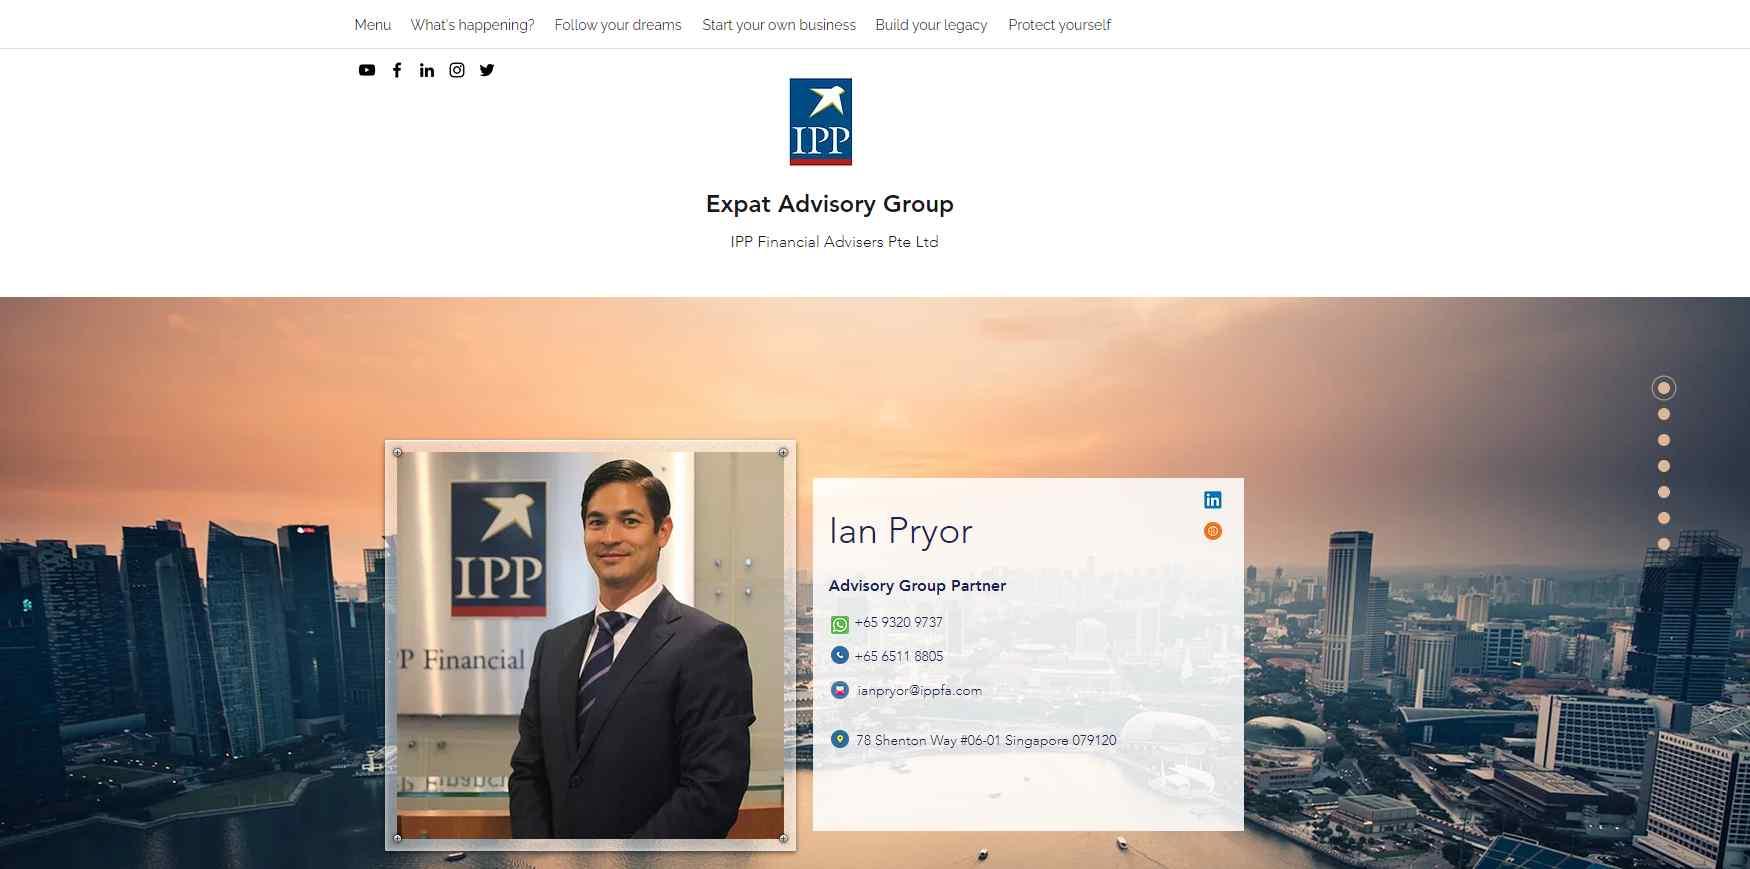 ian pryor Top Financial Advisors in Singapore